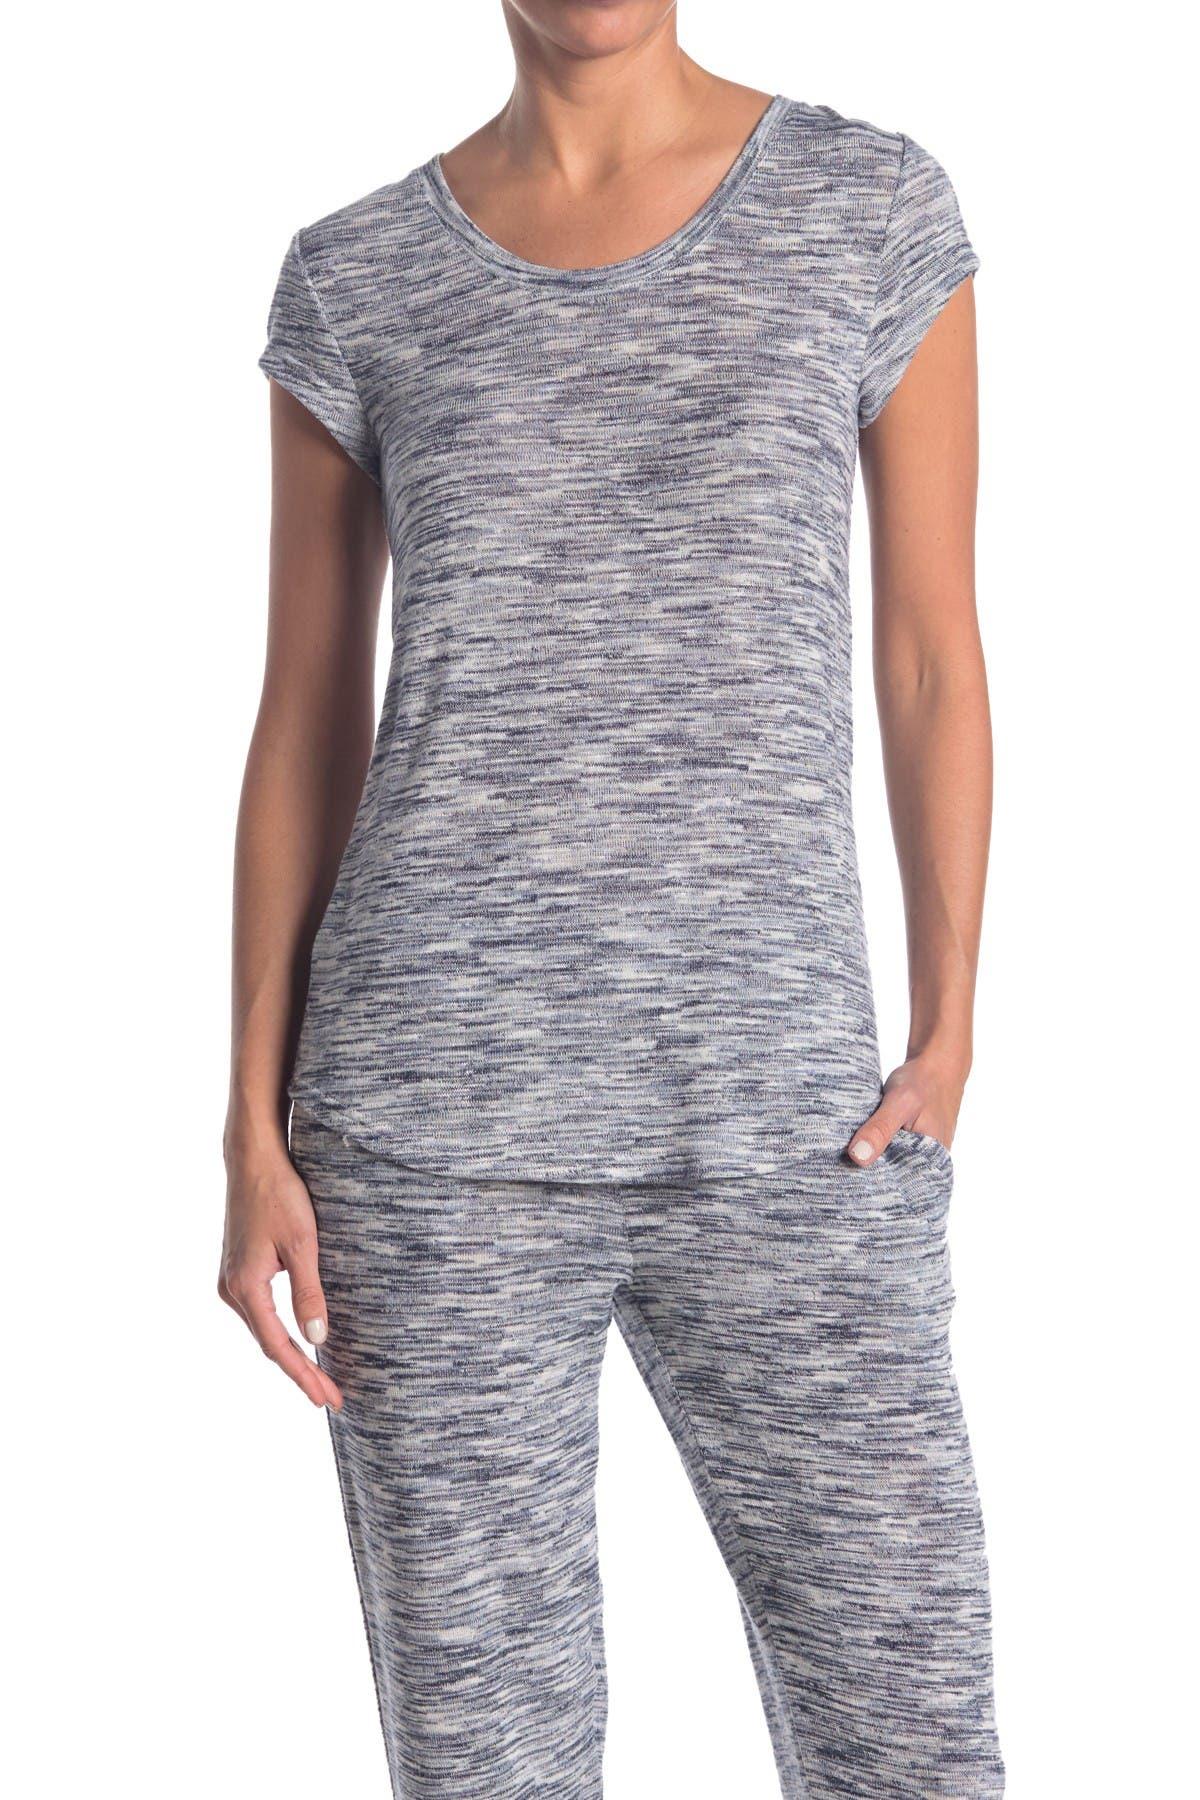 Image of HUE Space Dye Print Scoop Neck Pajama T-Shirt